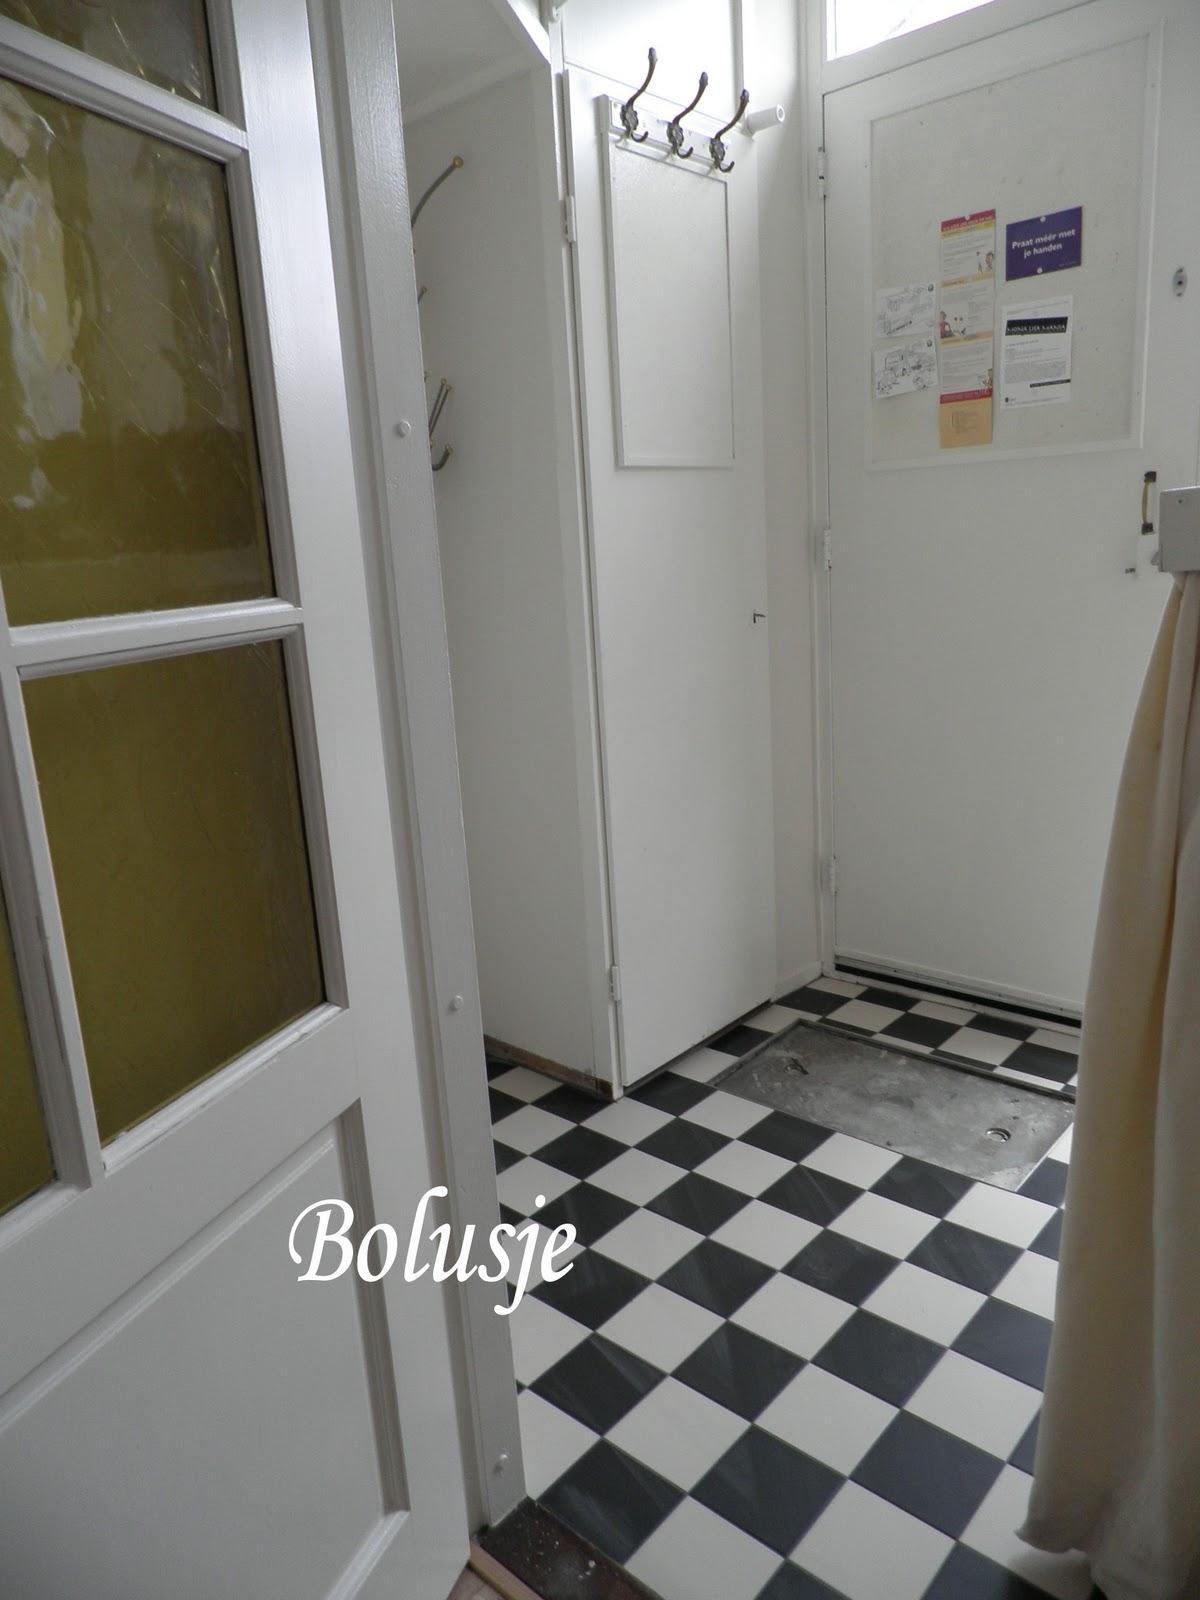 Bolusjes huis en honden: april 2011